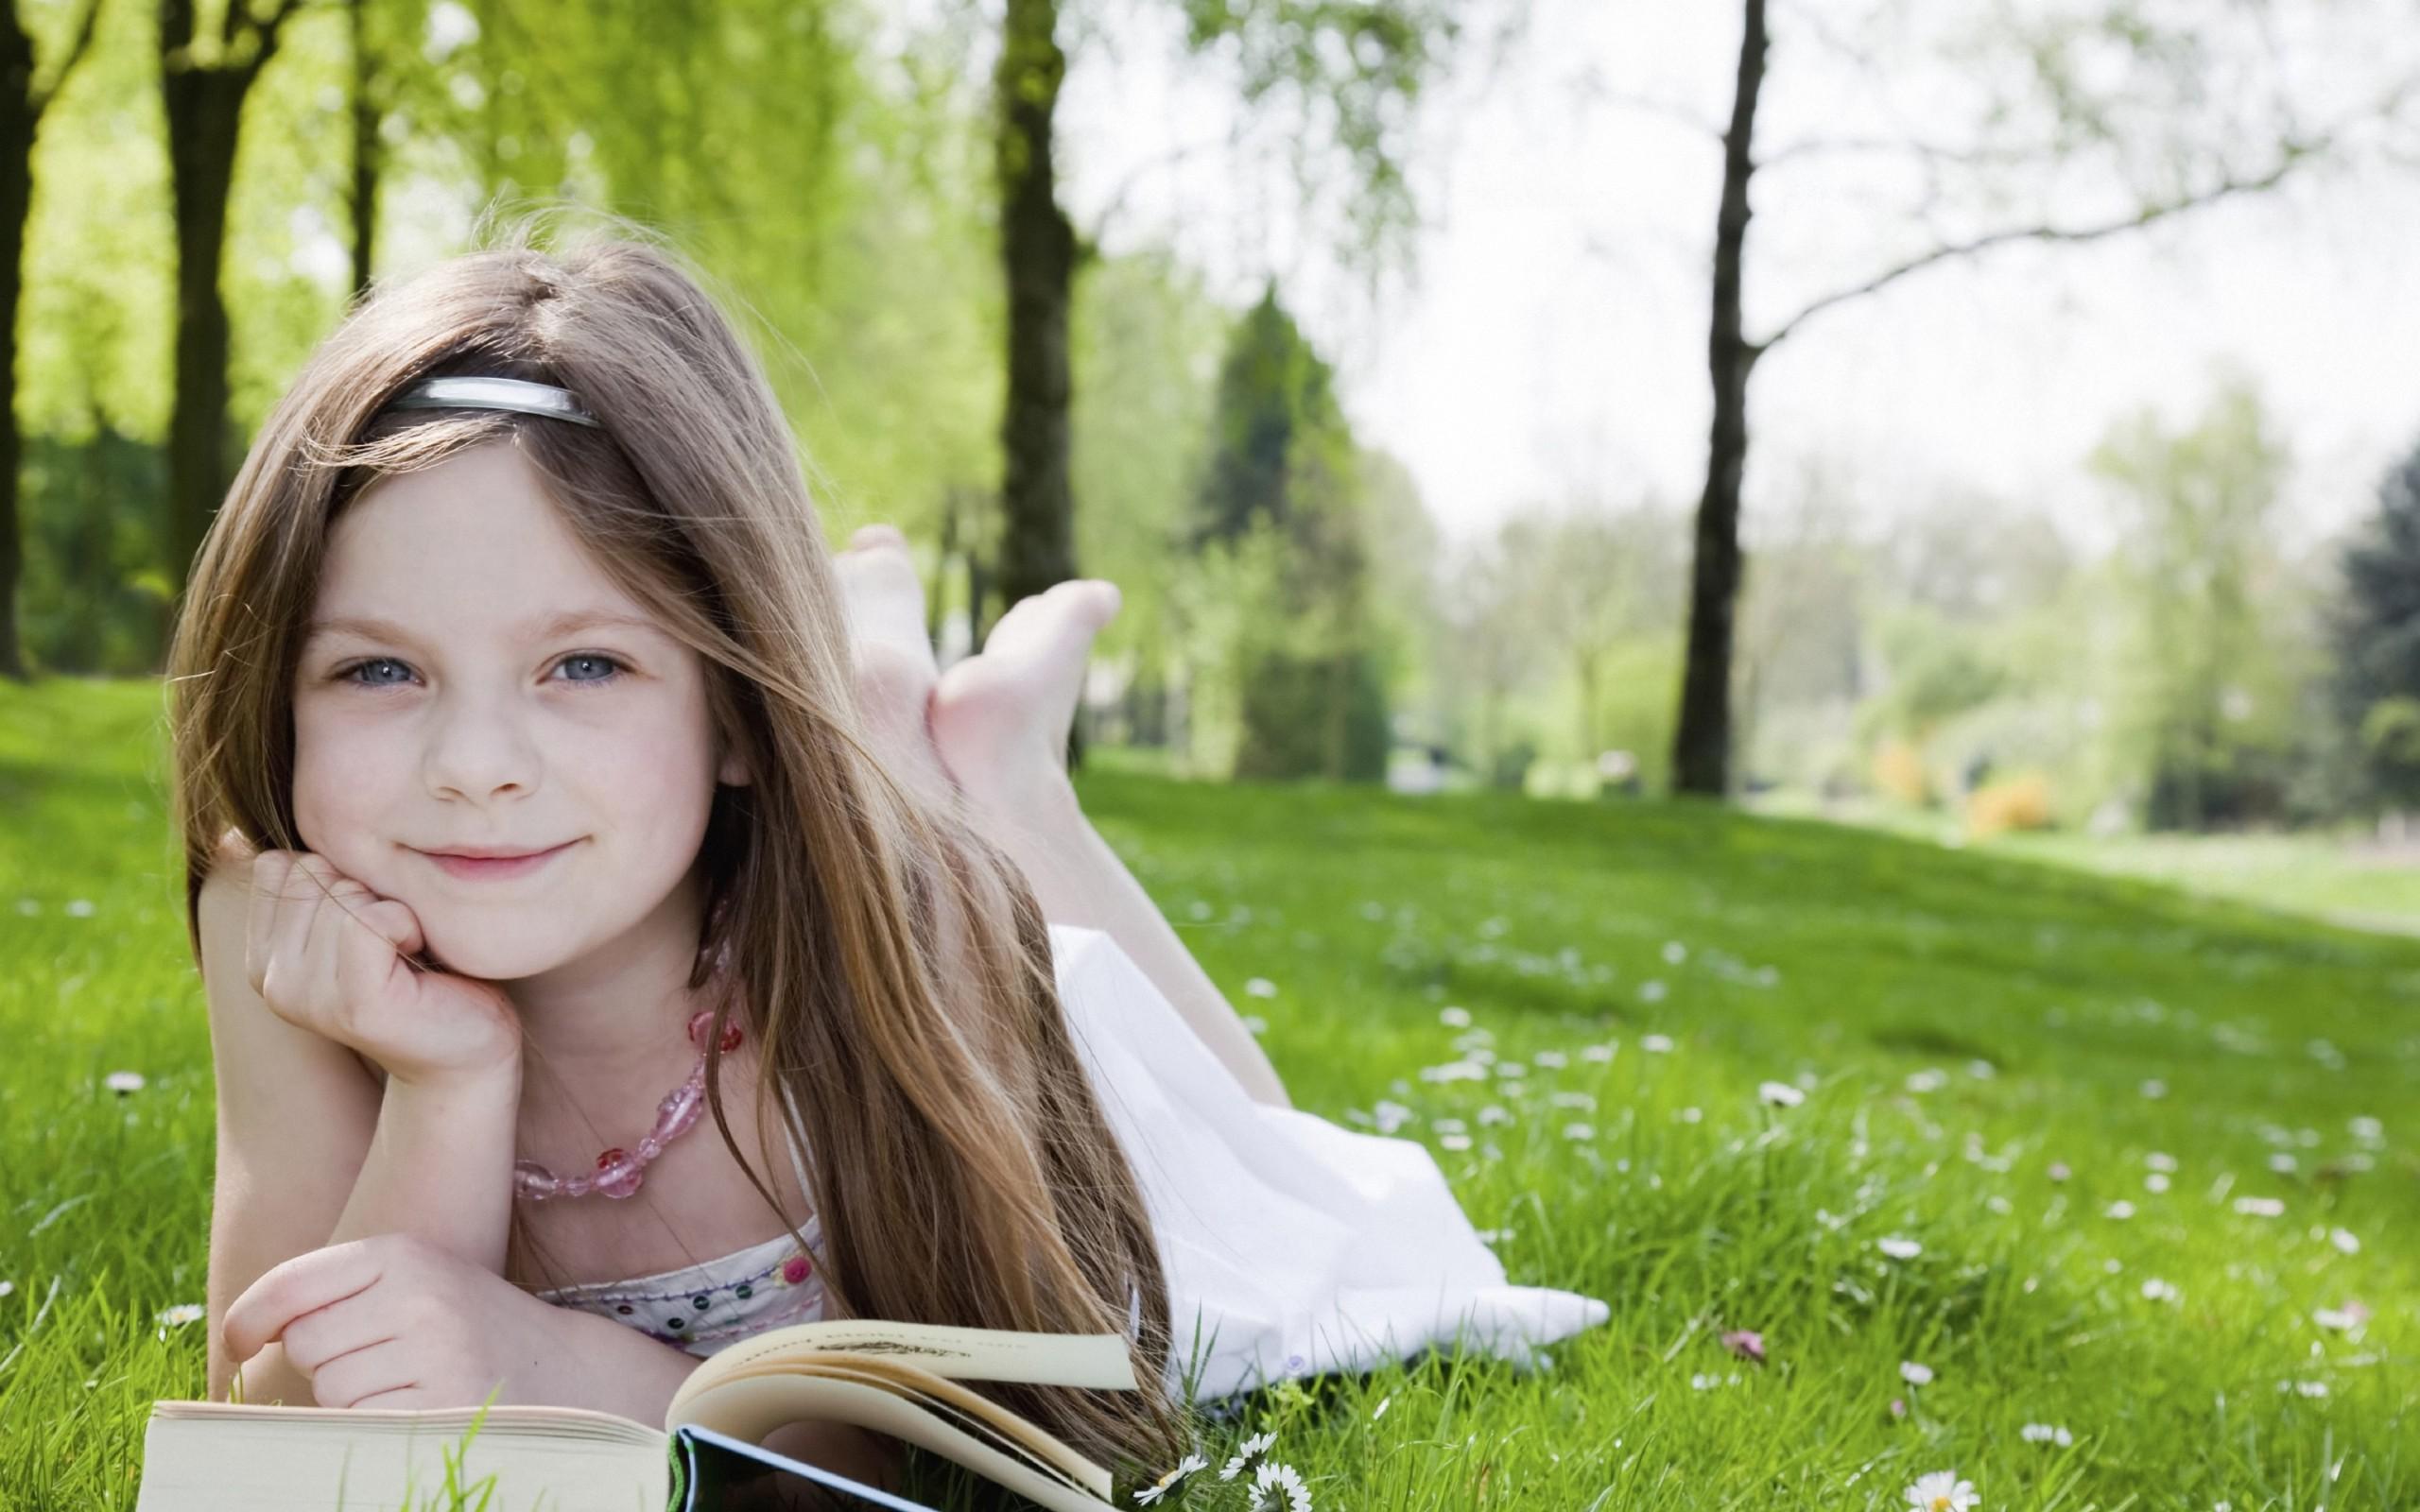 Cute Little Girl 8480 #7004136